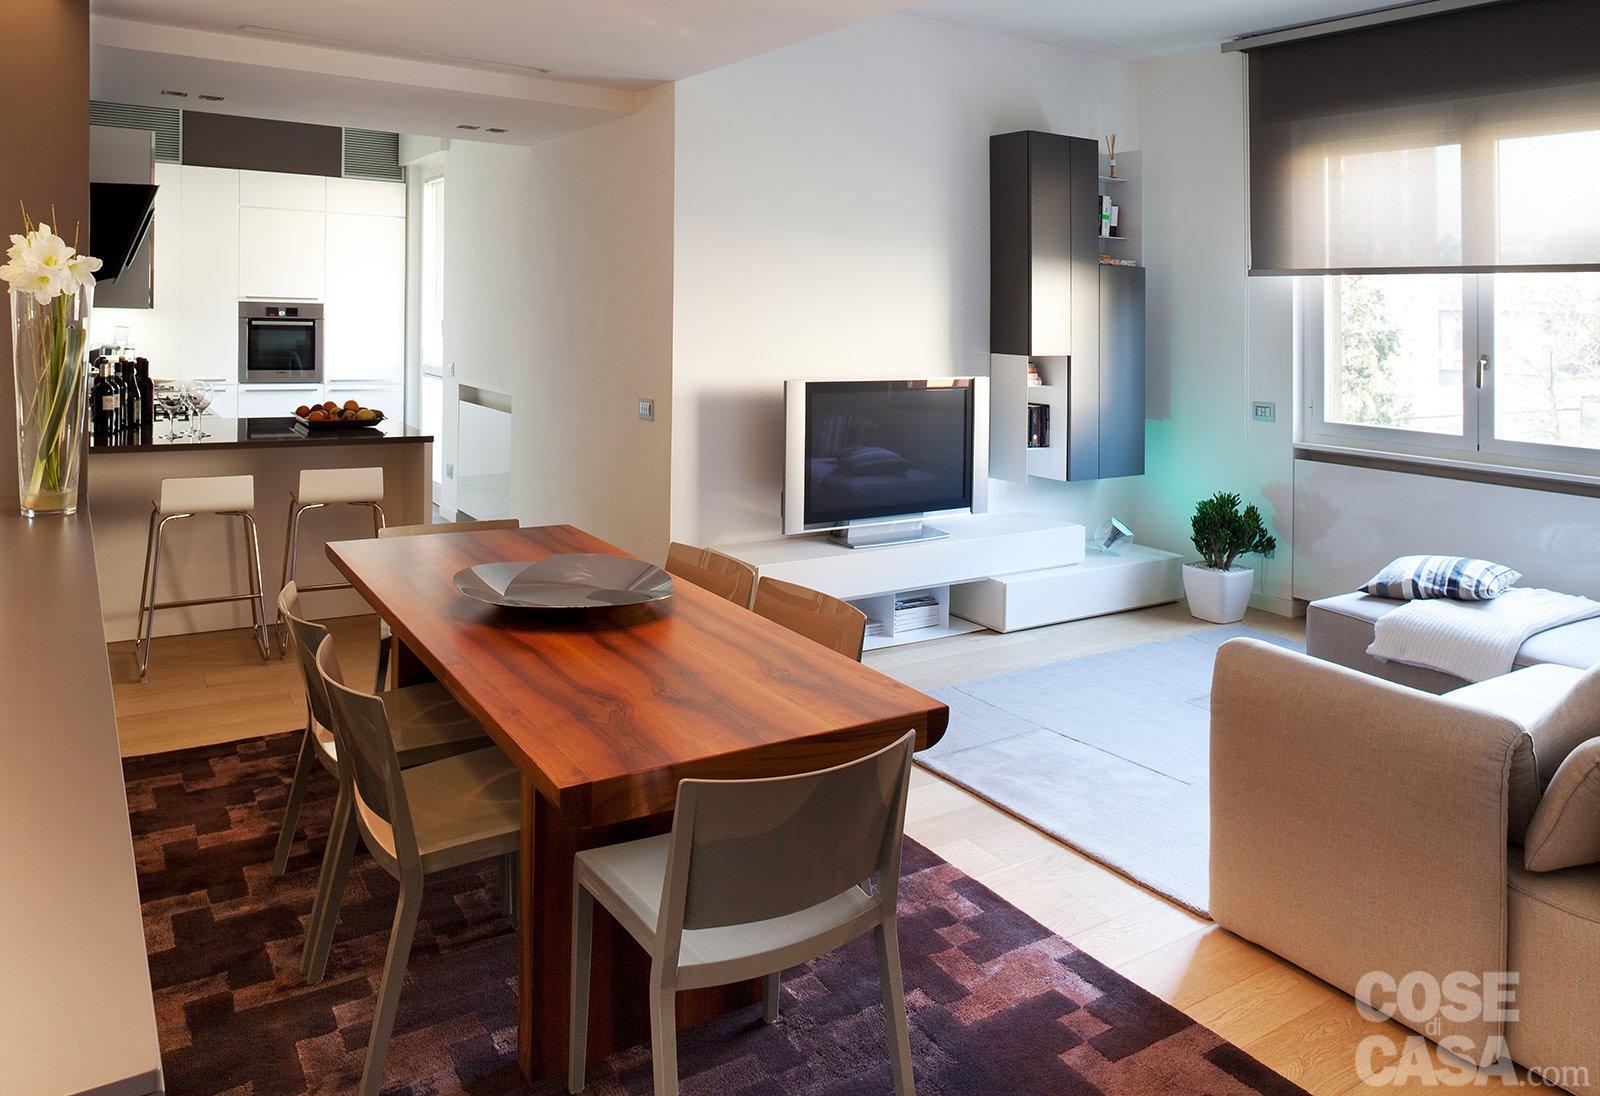 Casabook Immobiliare: gennaio 2014